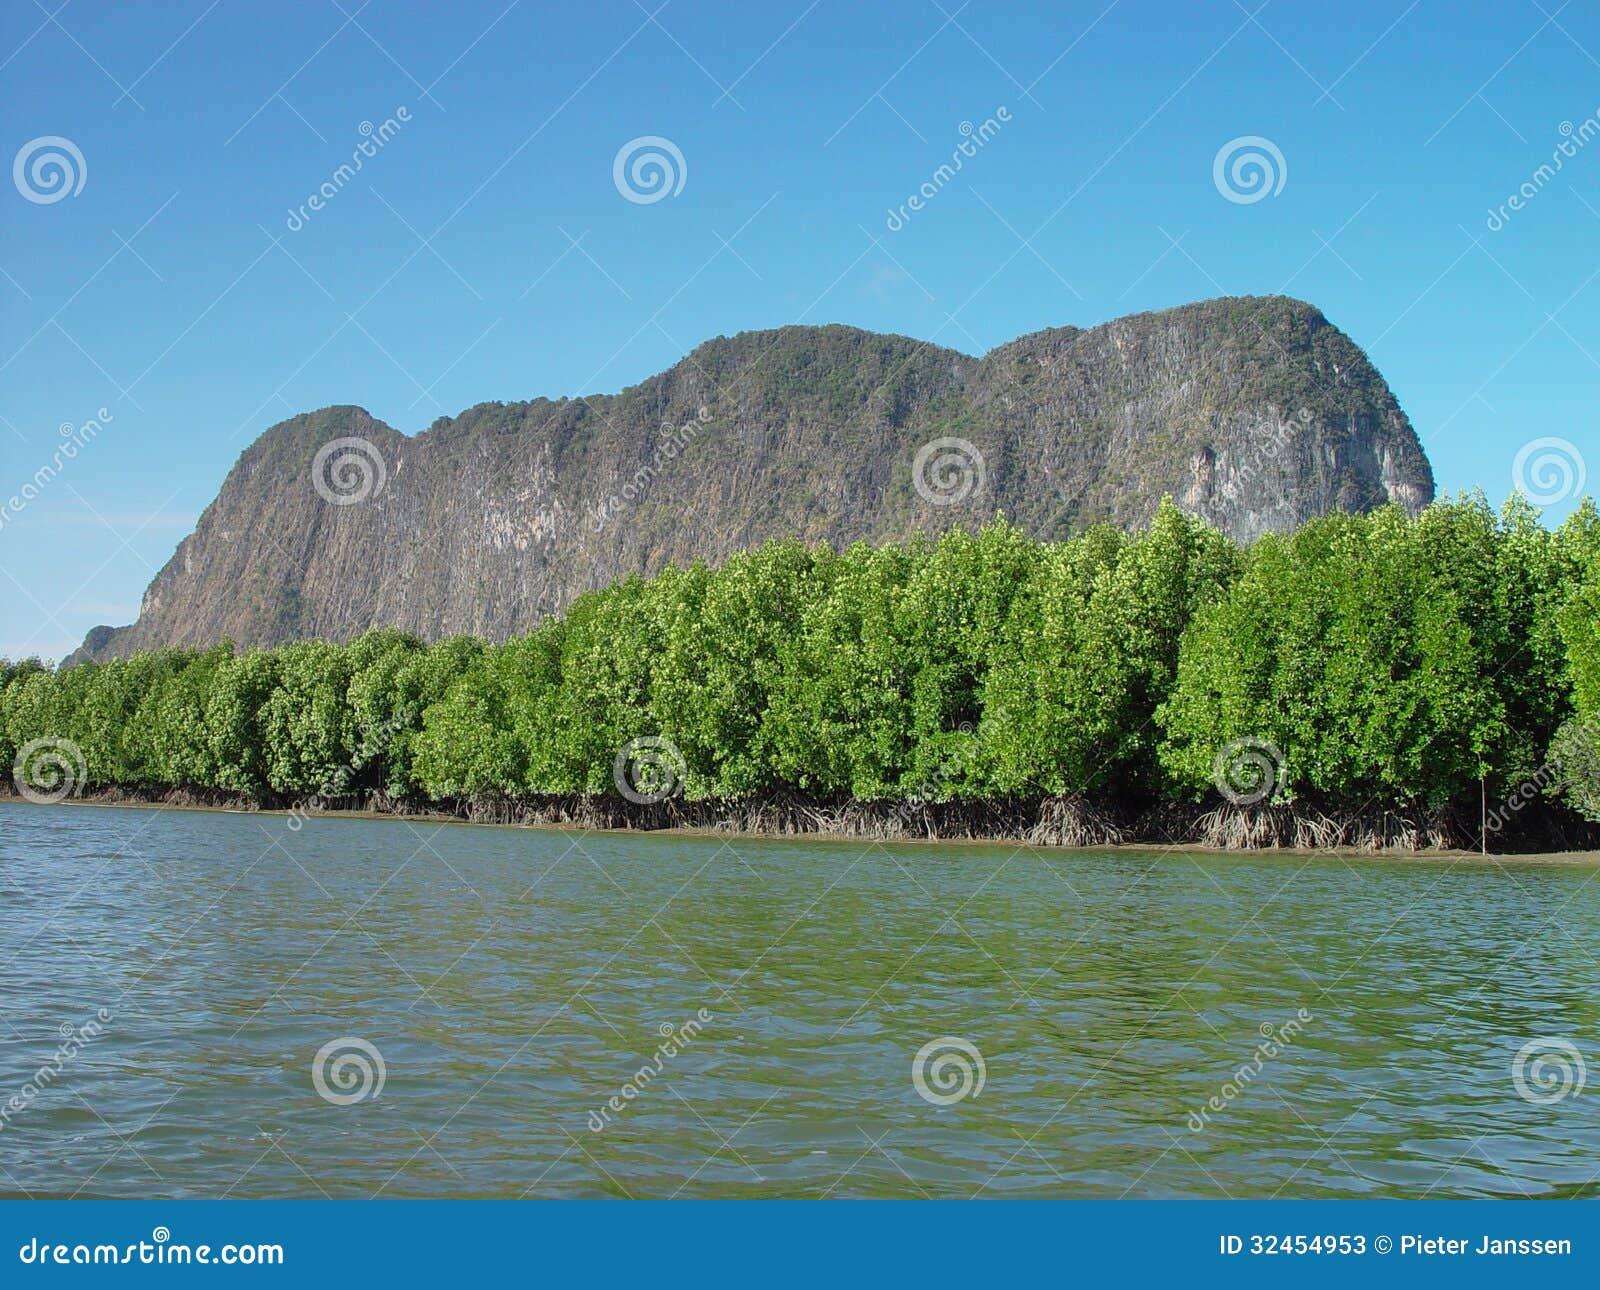 Mangrovie in Tailandia